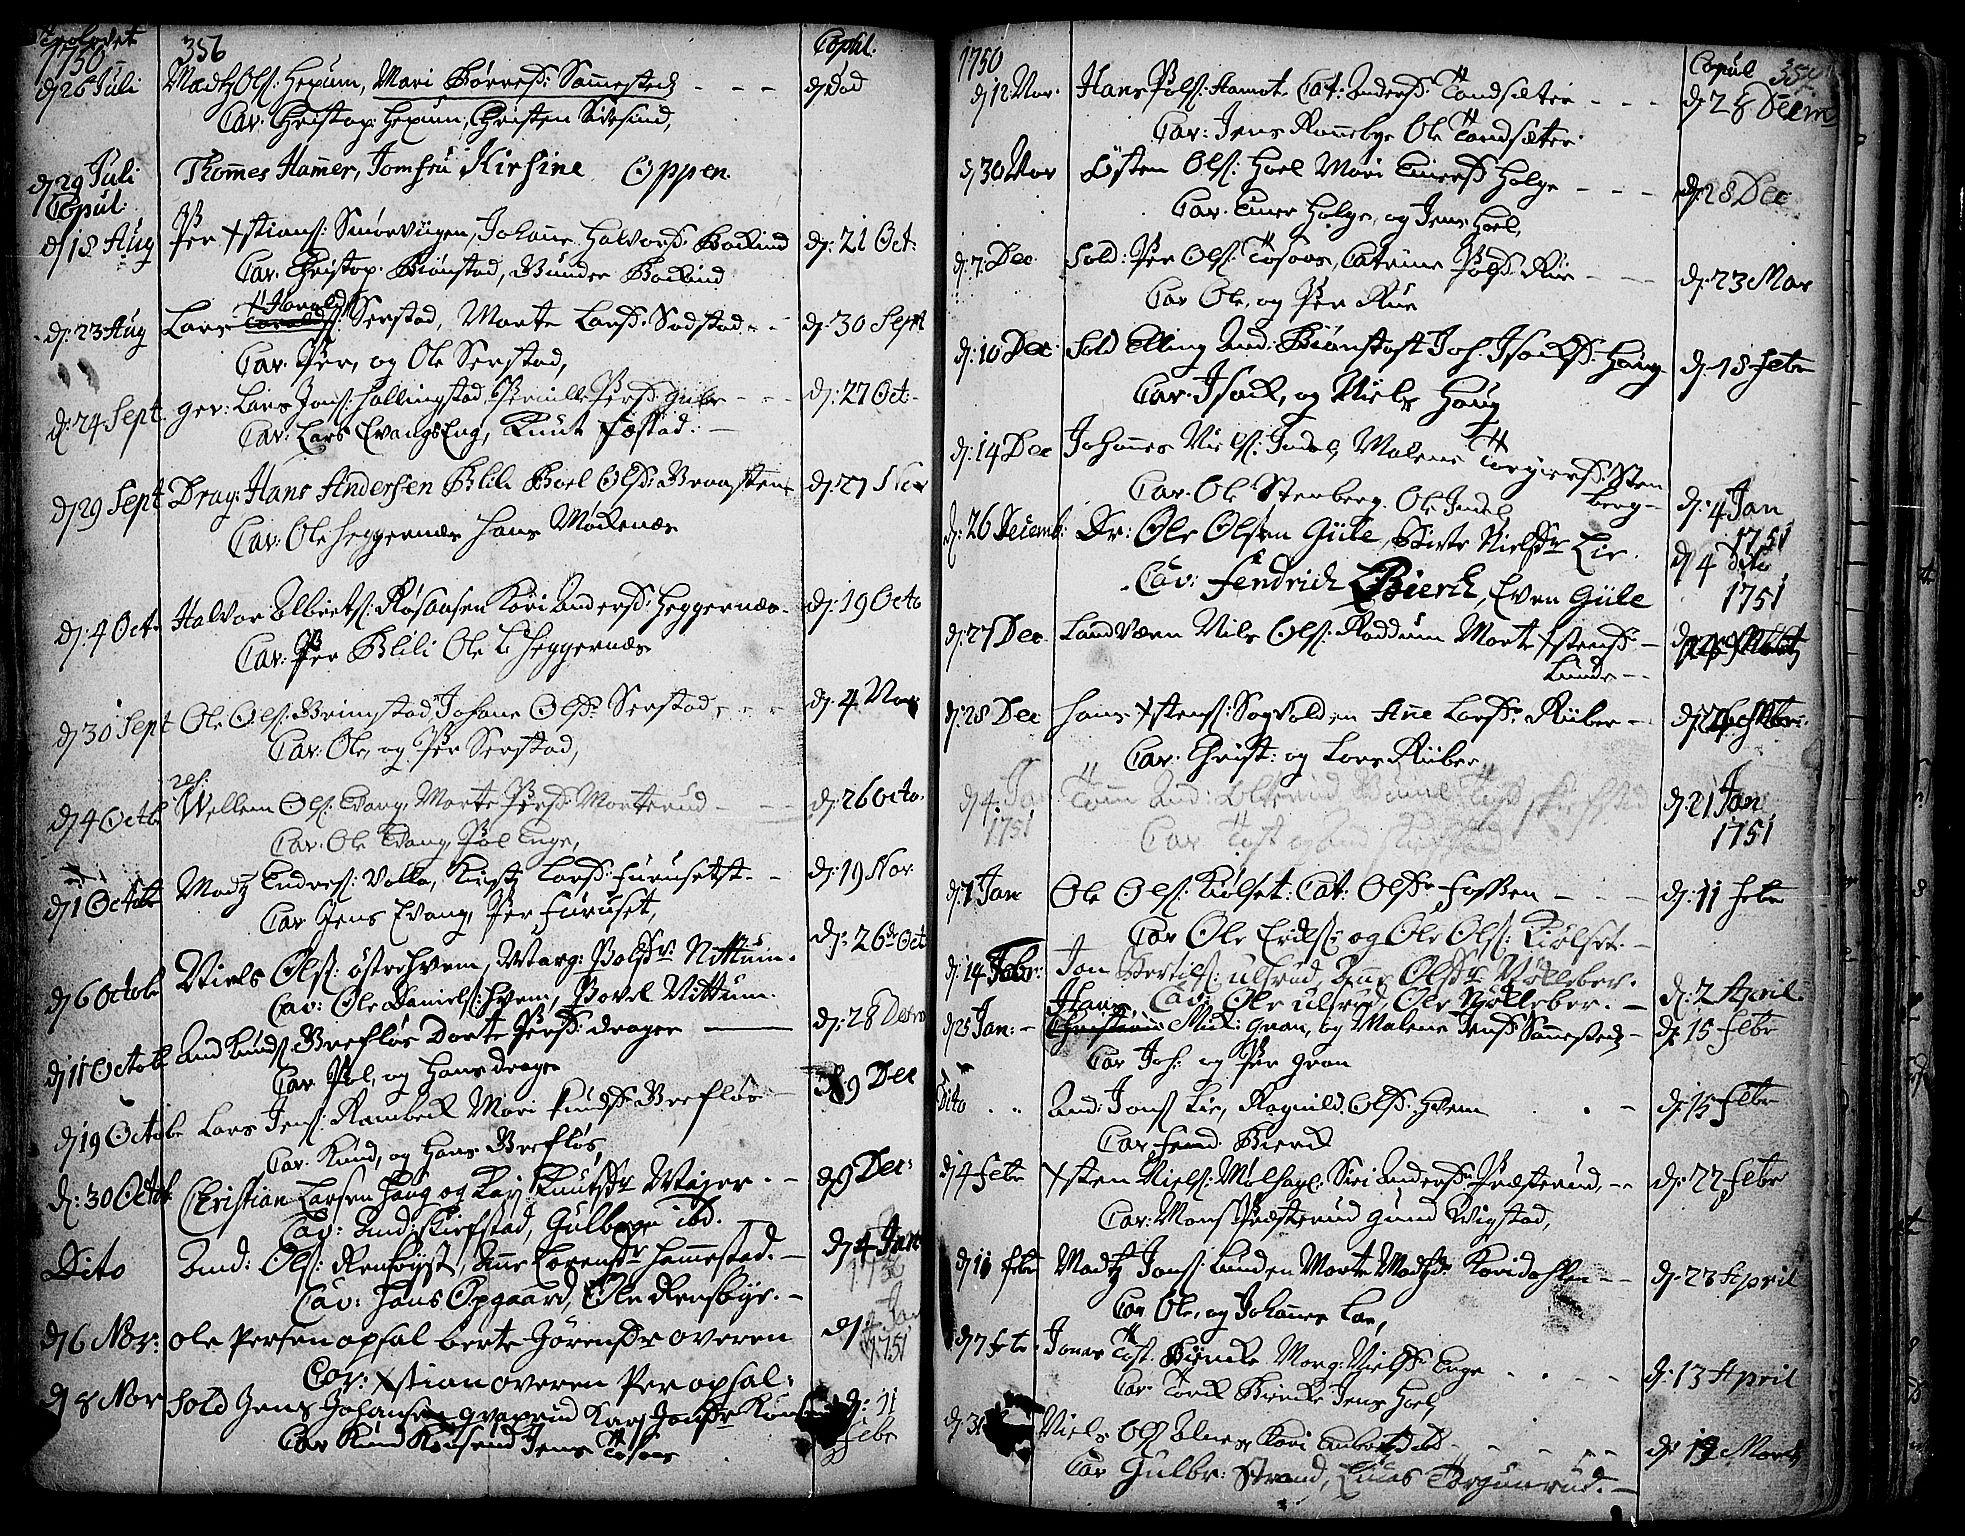 SAH, Toten prestekontor, Ministerialbok nr. 3, 1734-1751, s. 356-357